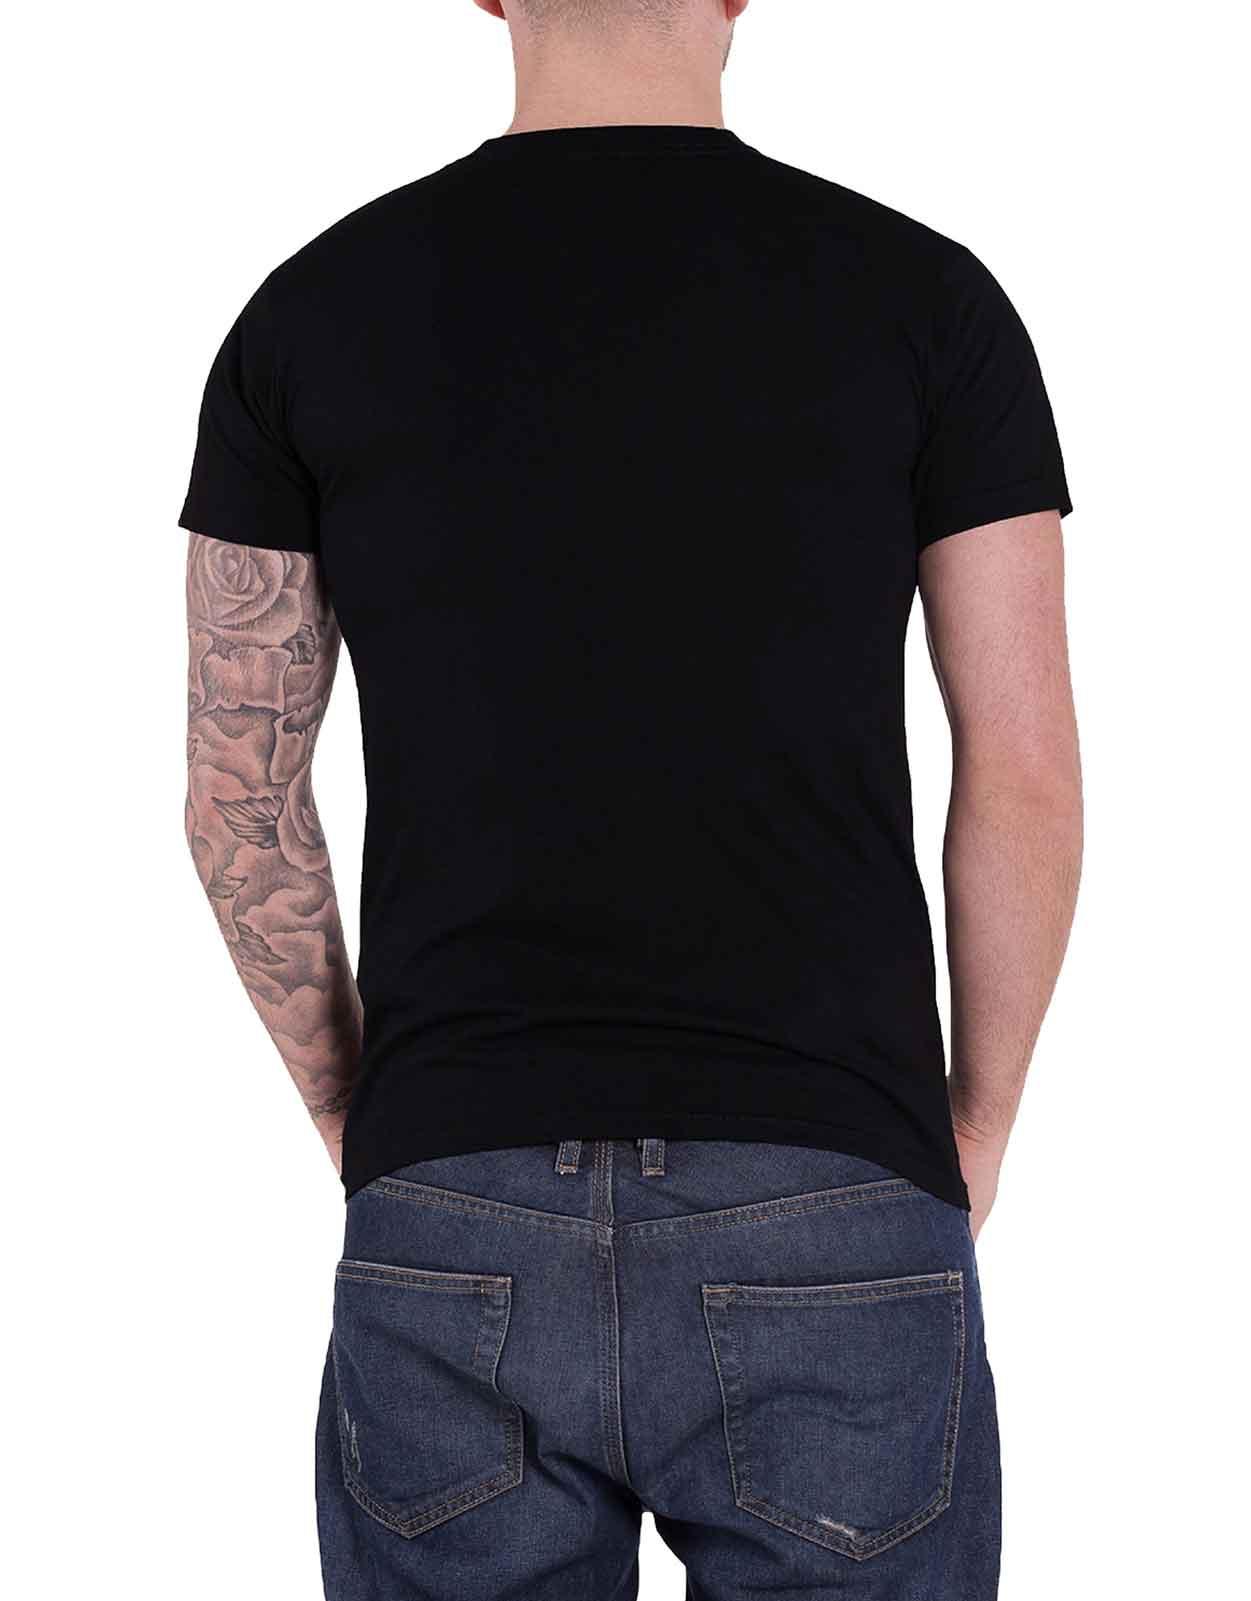 Officiel-Jimi-Hendrix-T-Shirt-Purple-Haze-Are-you-experienced-Logo-Homme-NEUF miniature 31